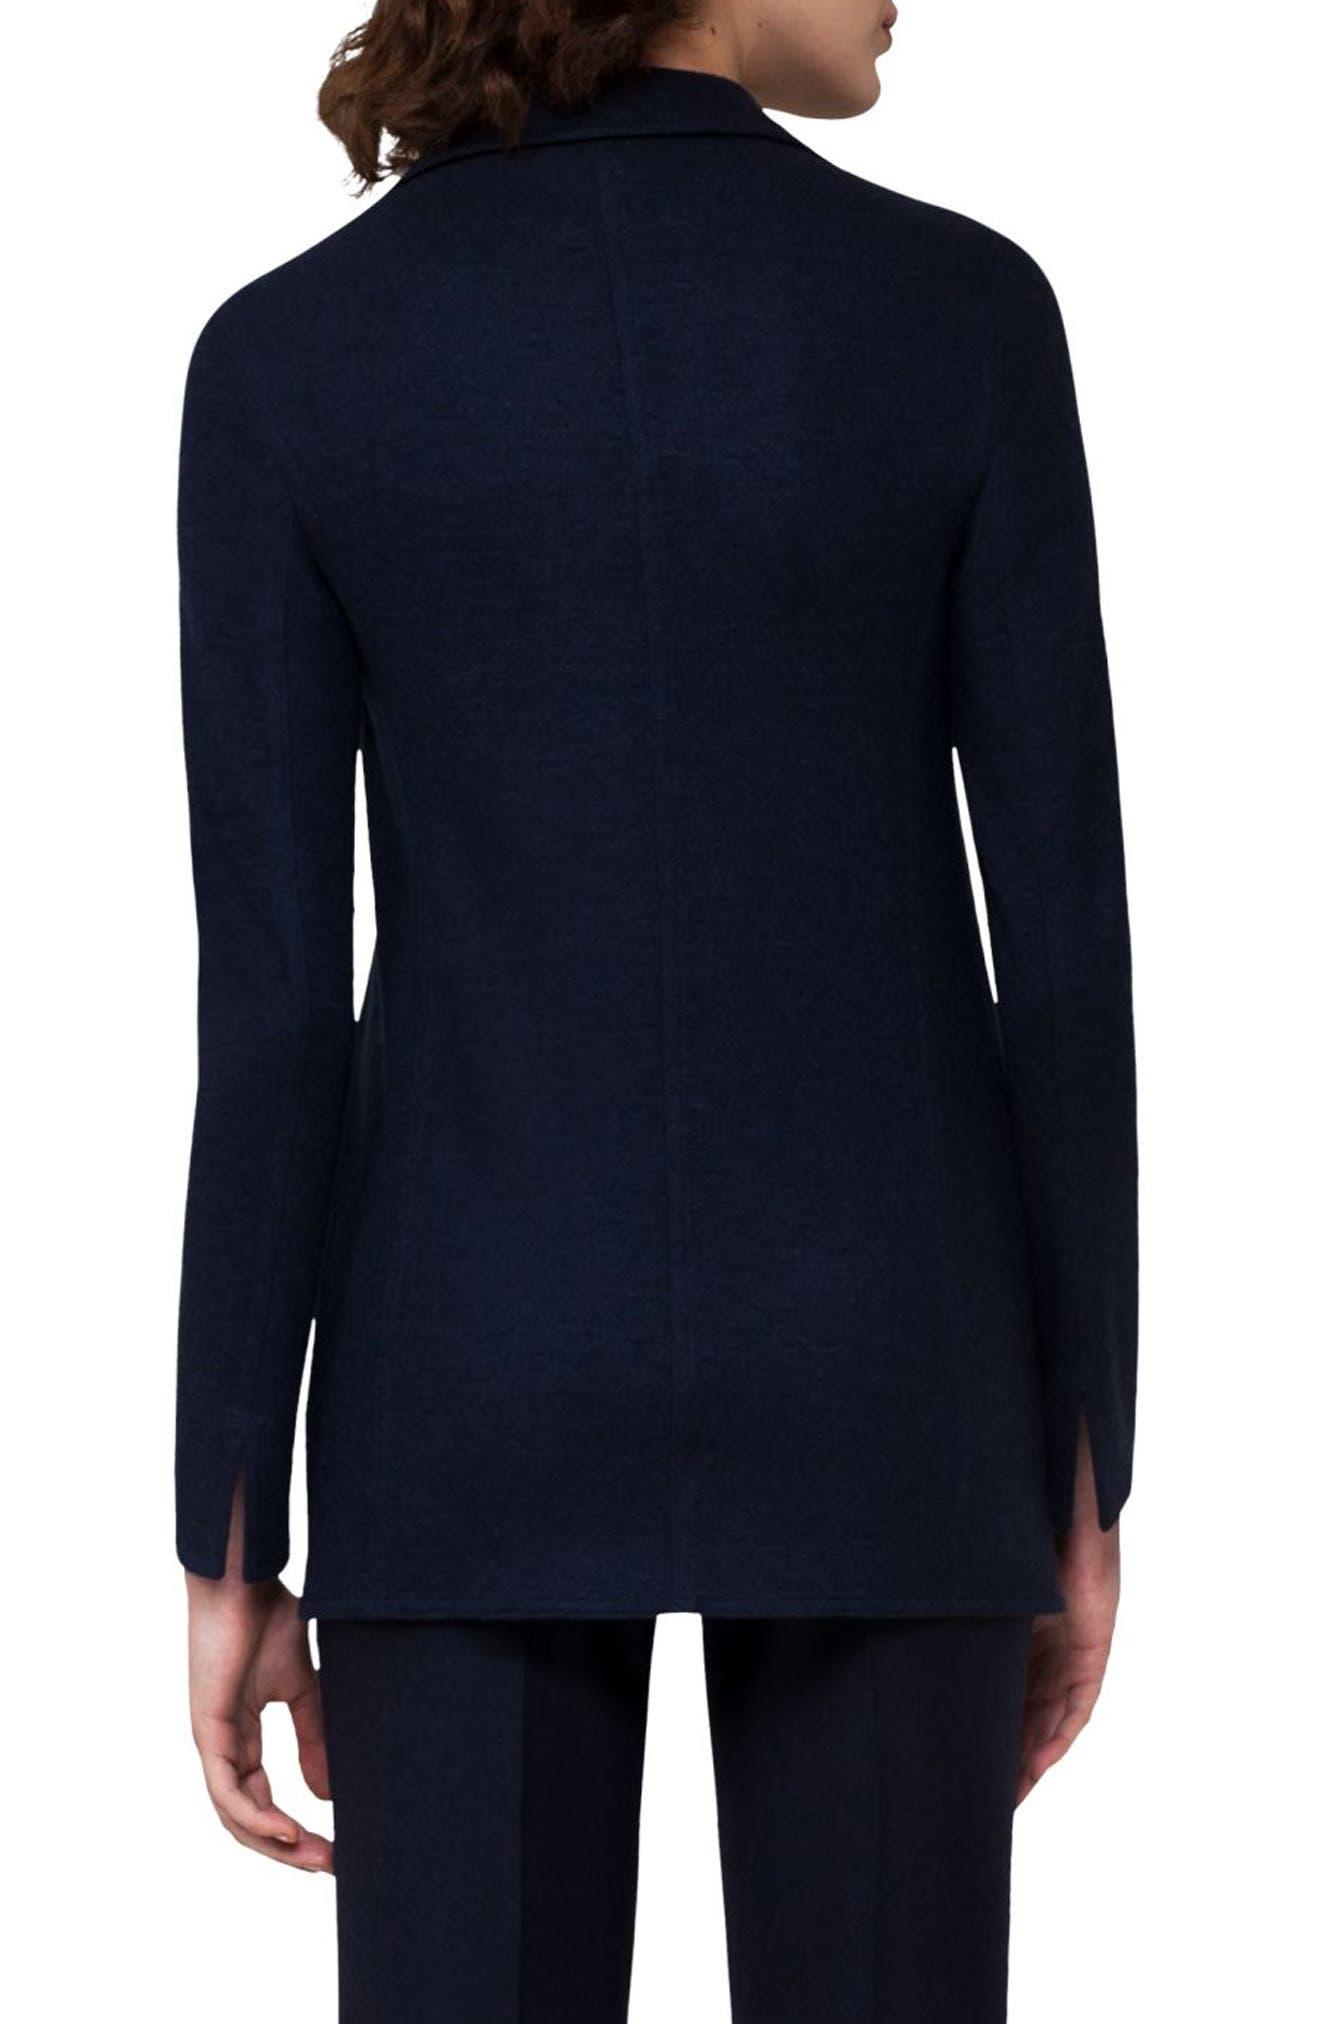 Cashmere Blend Jersey Jacket,                             Alternate thumbnail 2, color,                             400